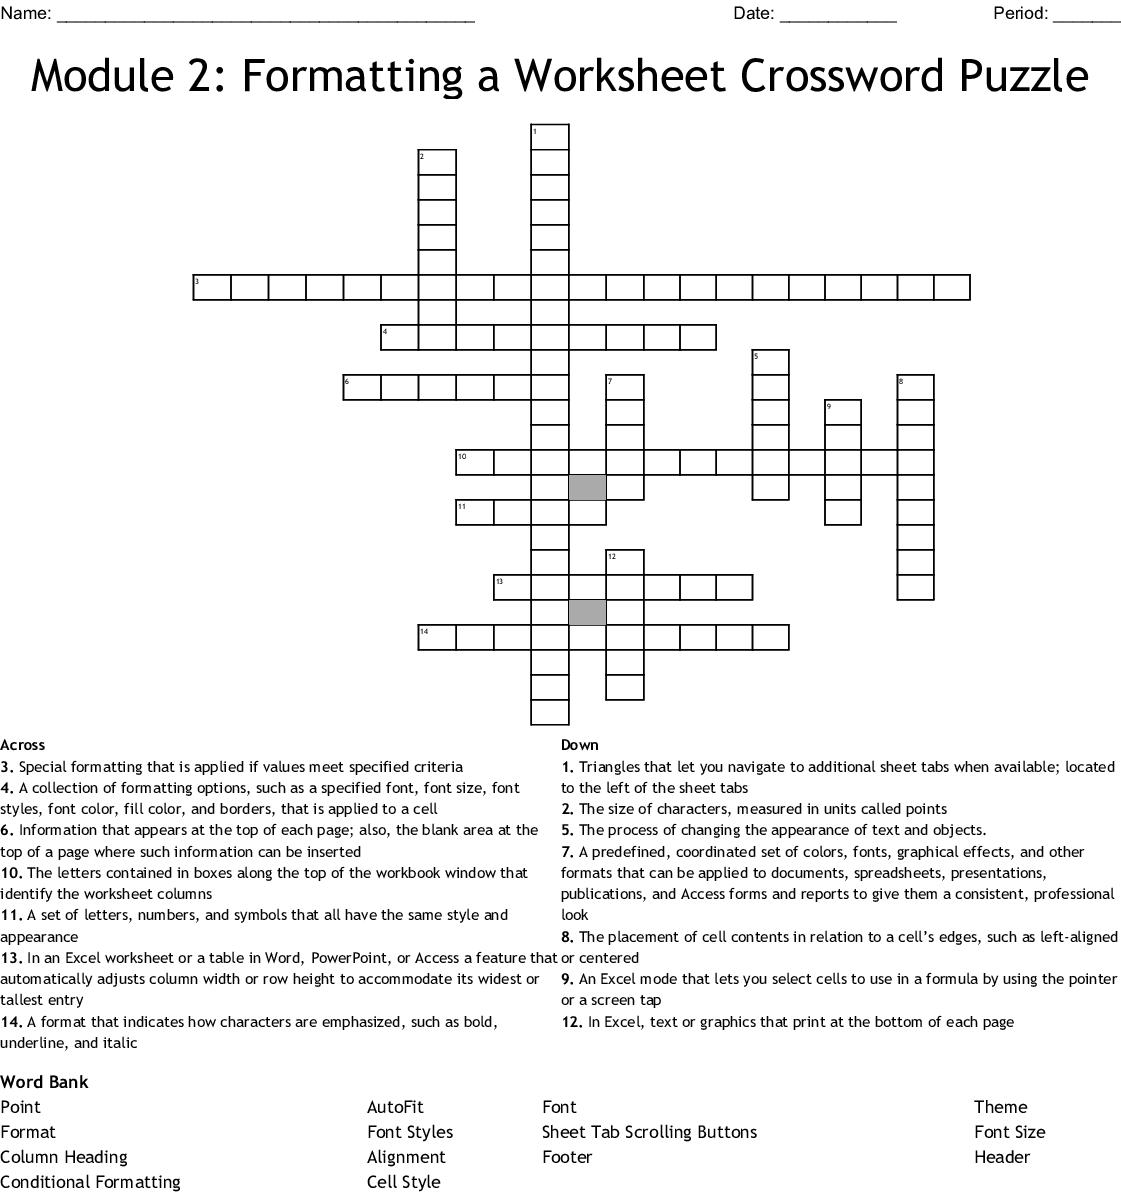 Module 2 Formatting A Worksheet Crossword Puzzle